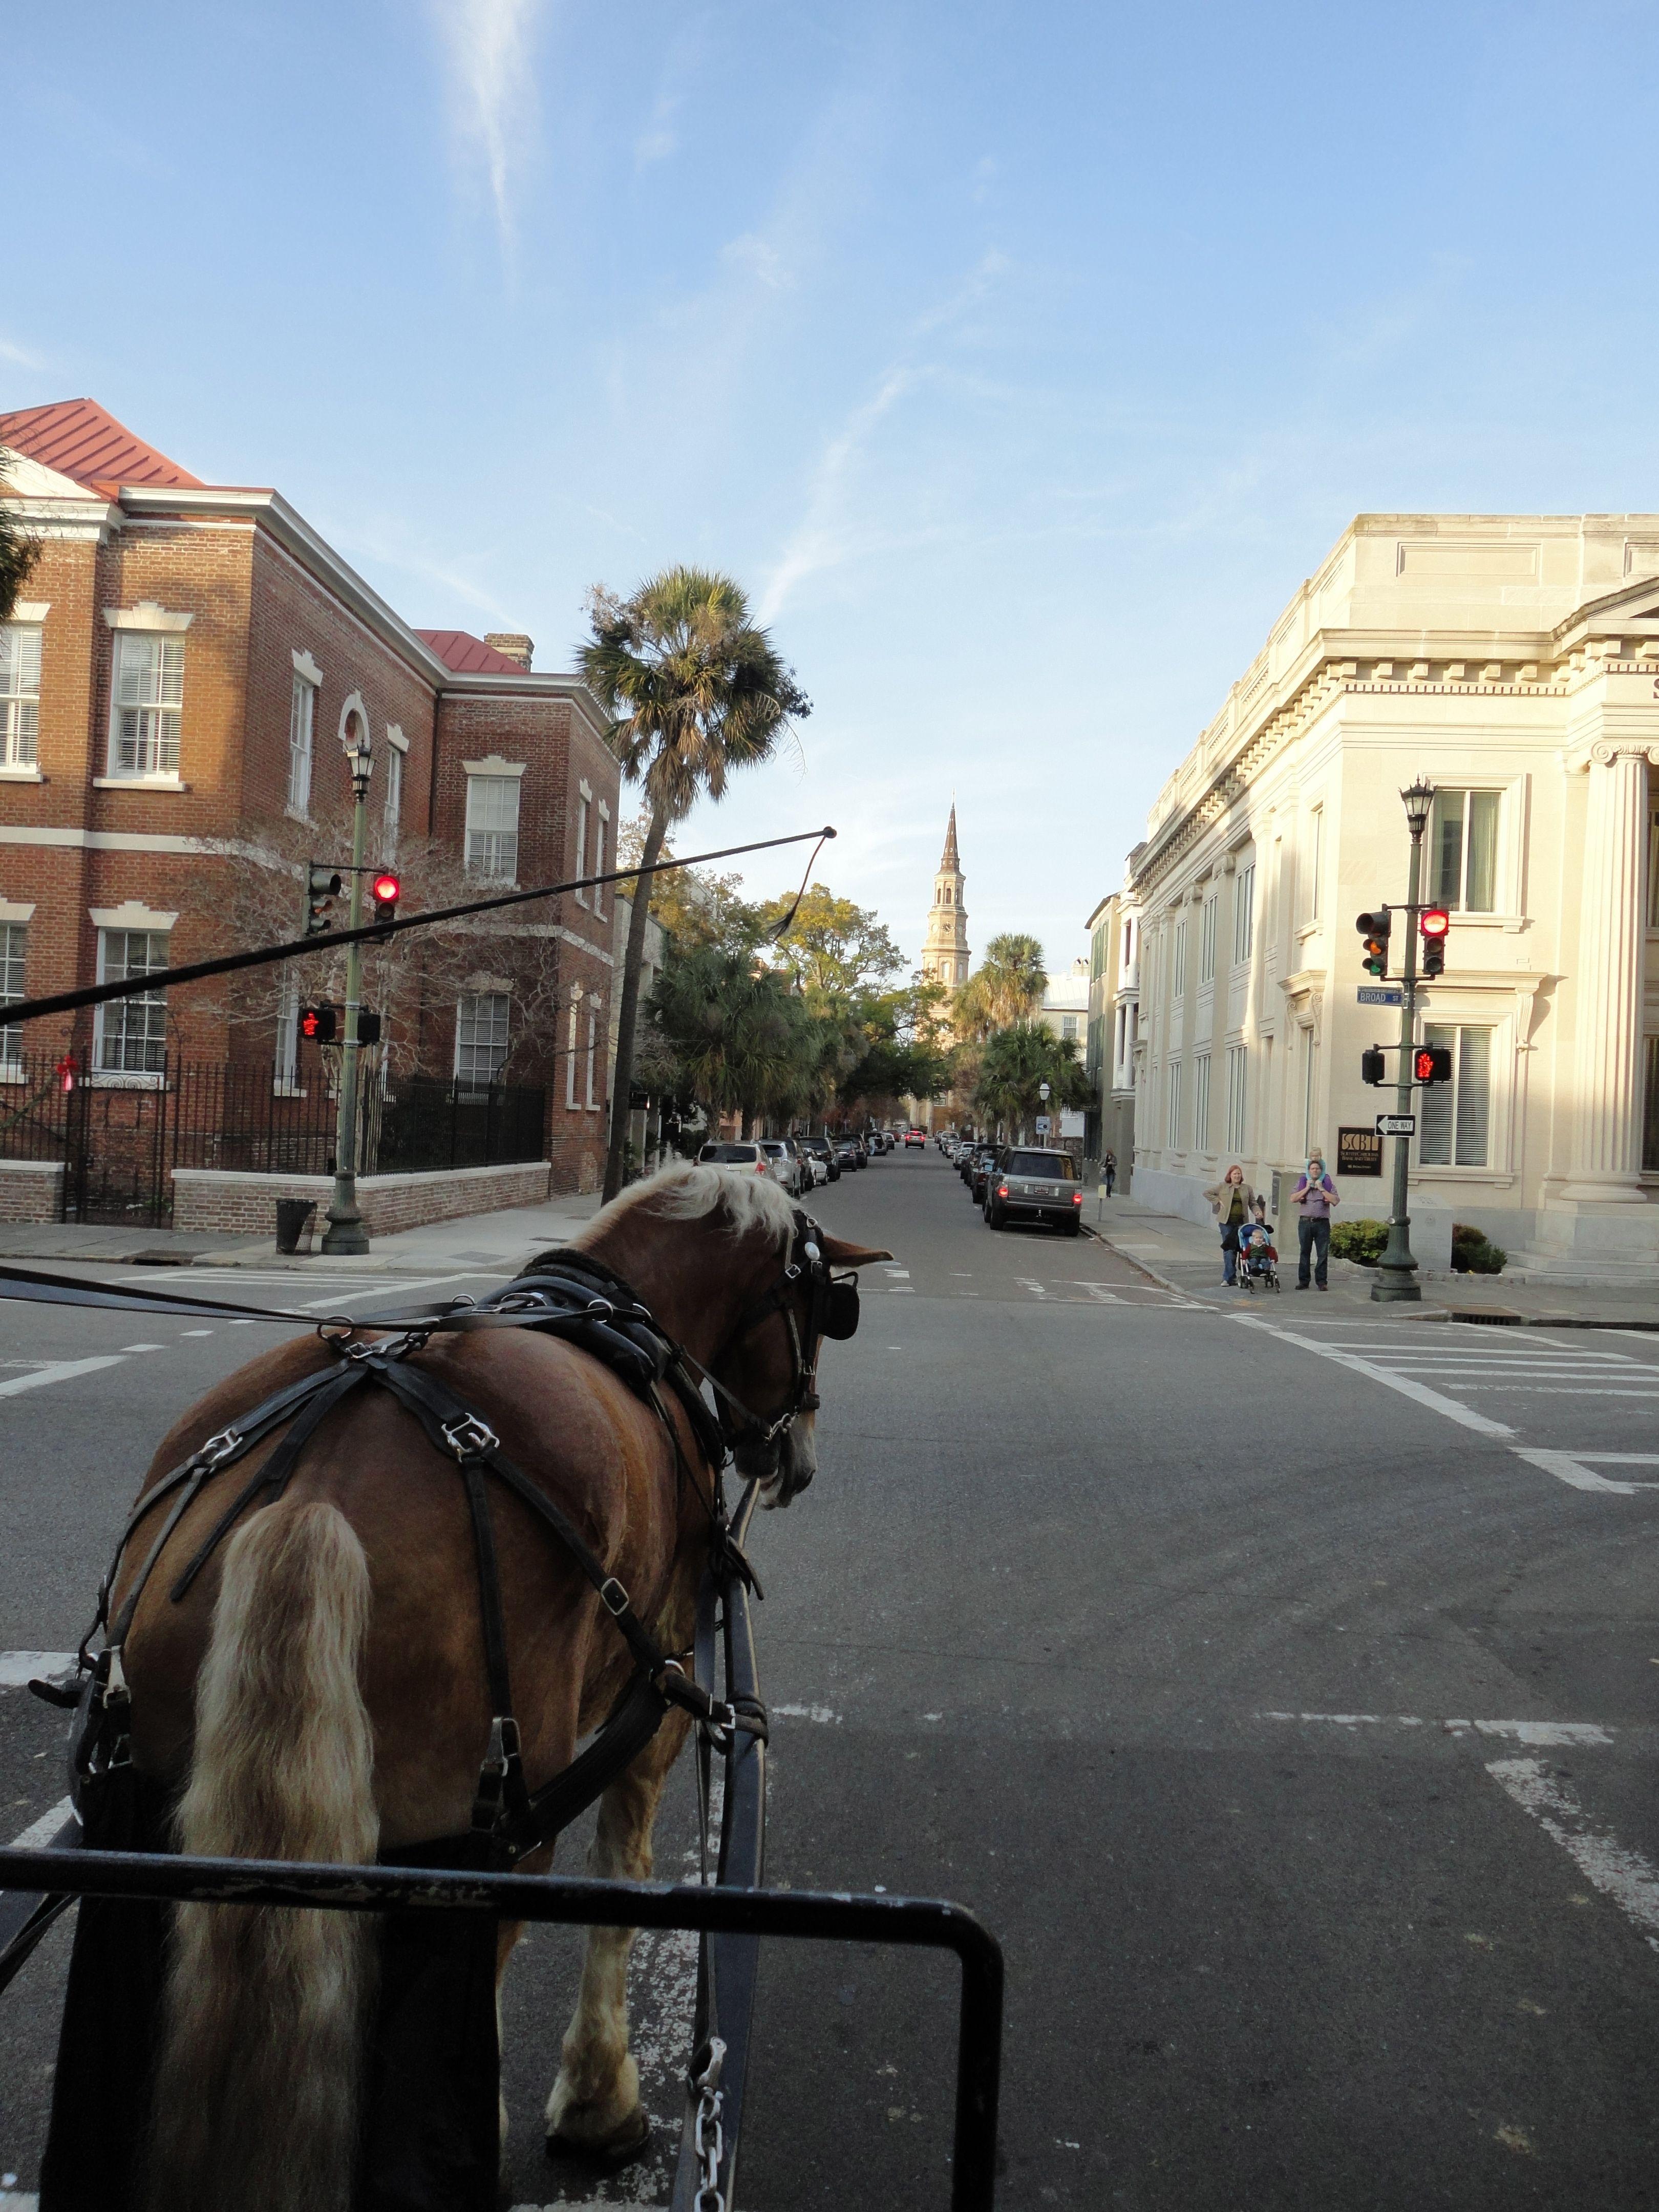 Bucket list, Charleston, SC. Go on a buggy tour to learn